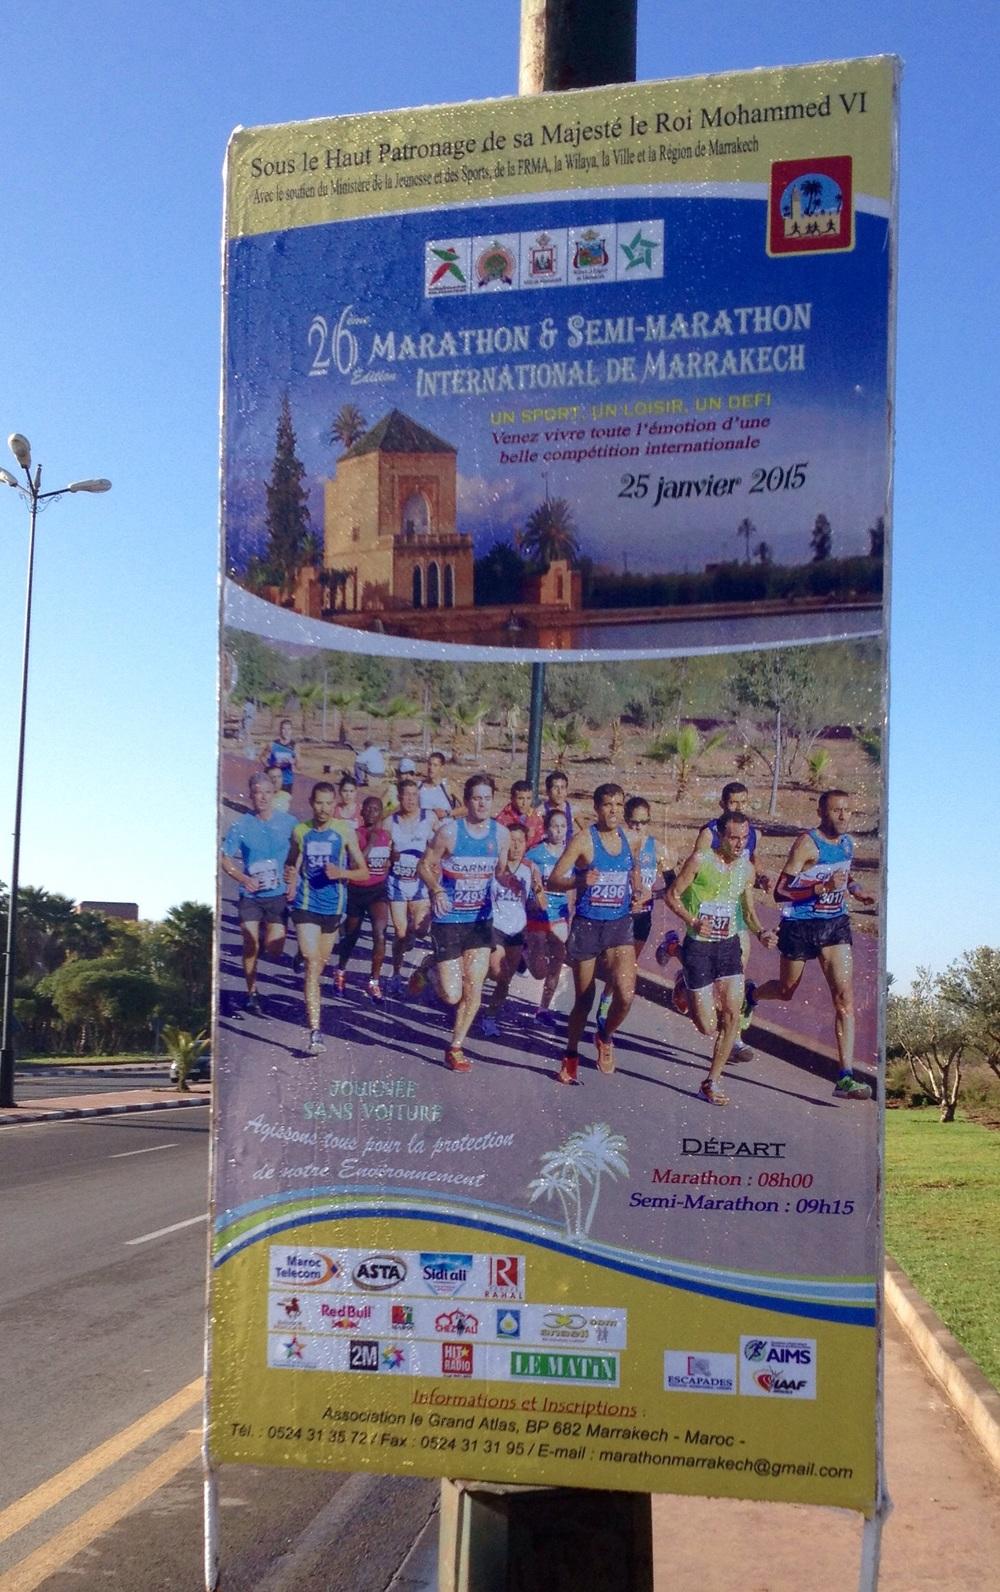 Marrakech Marathon race poster